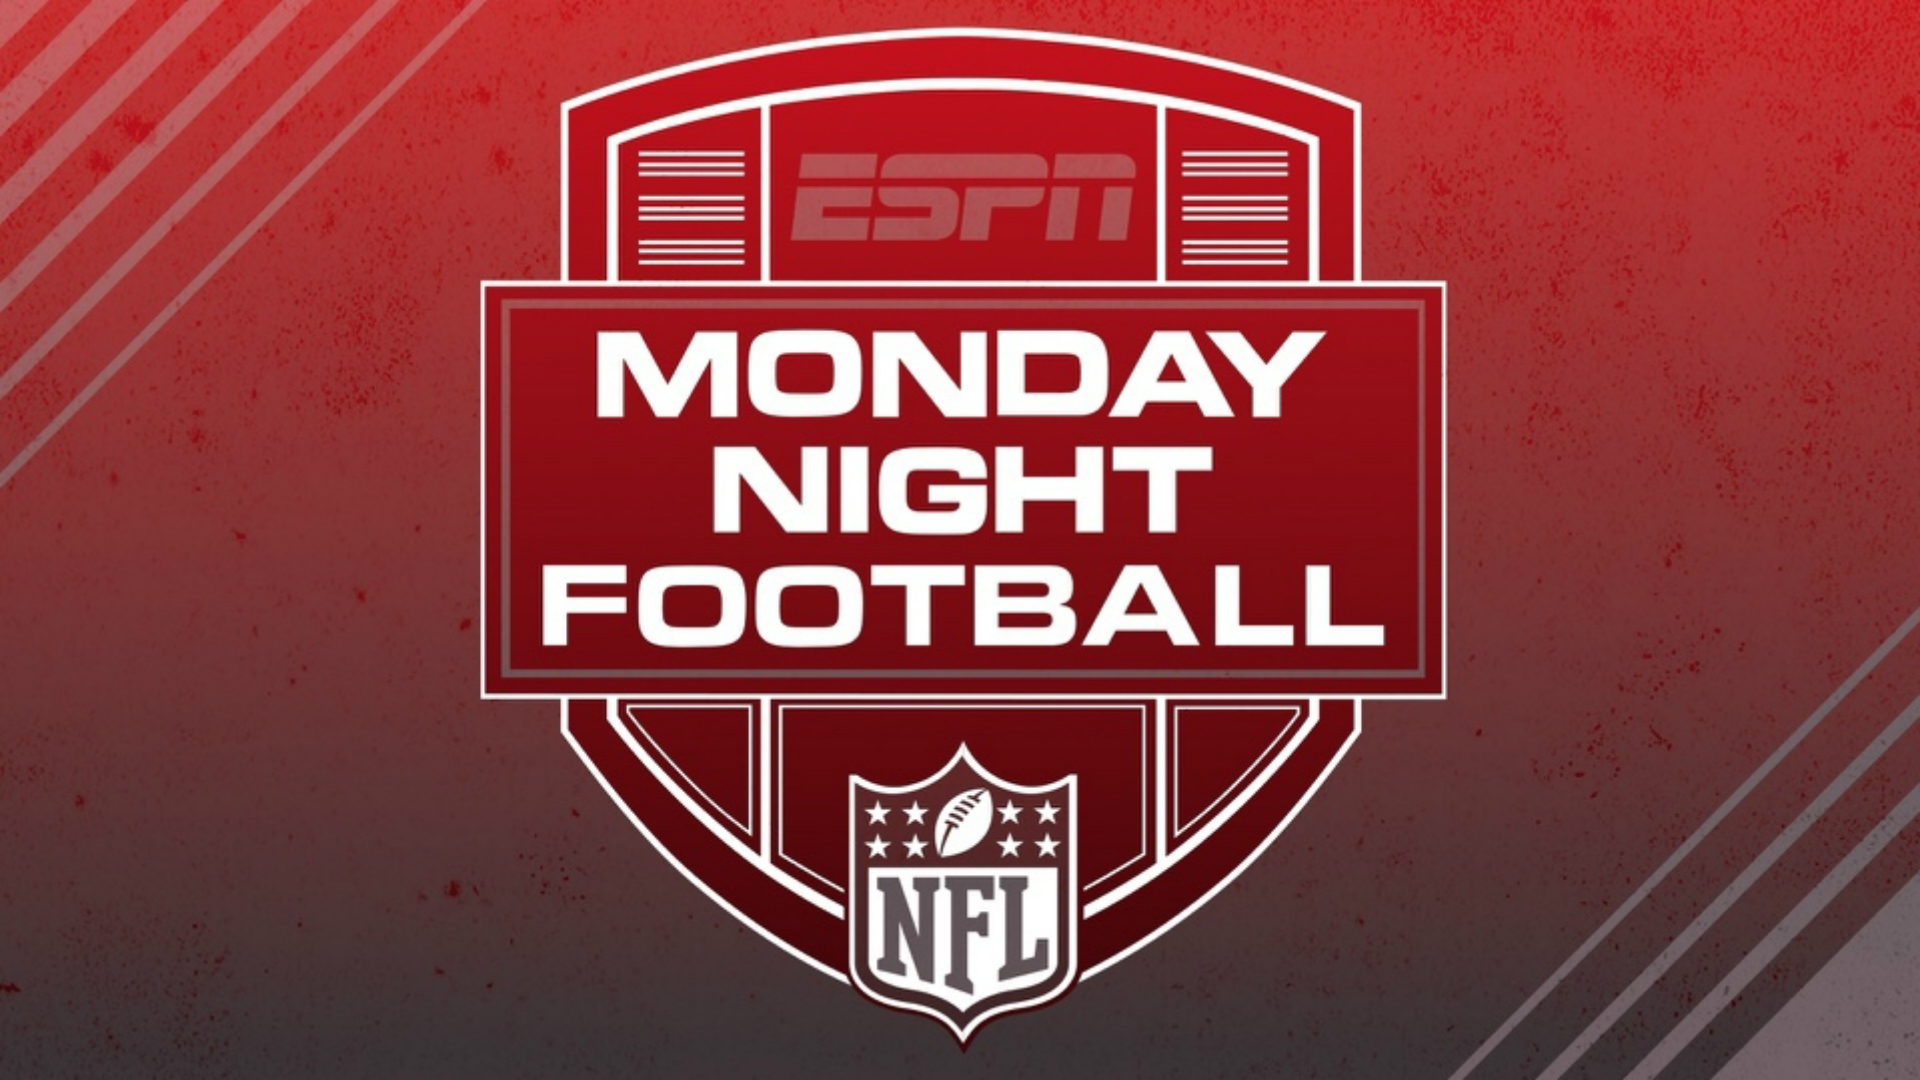 Monday-night-football-mnf-091817-ftrjpg_1pdbzpt9aq48e1721hlggmdtwy